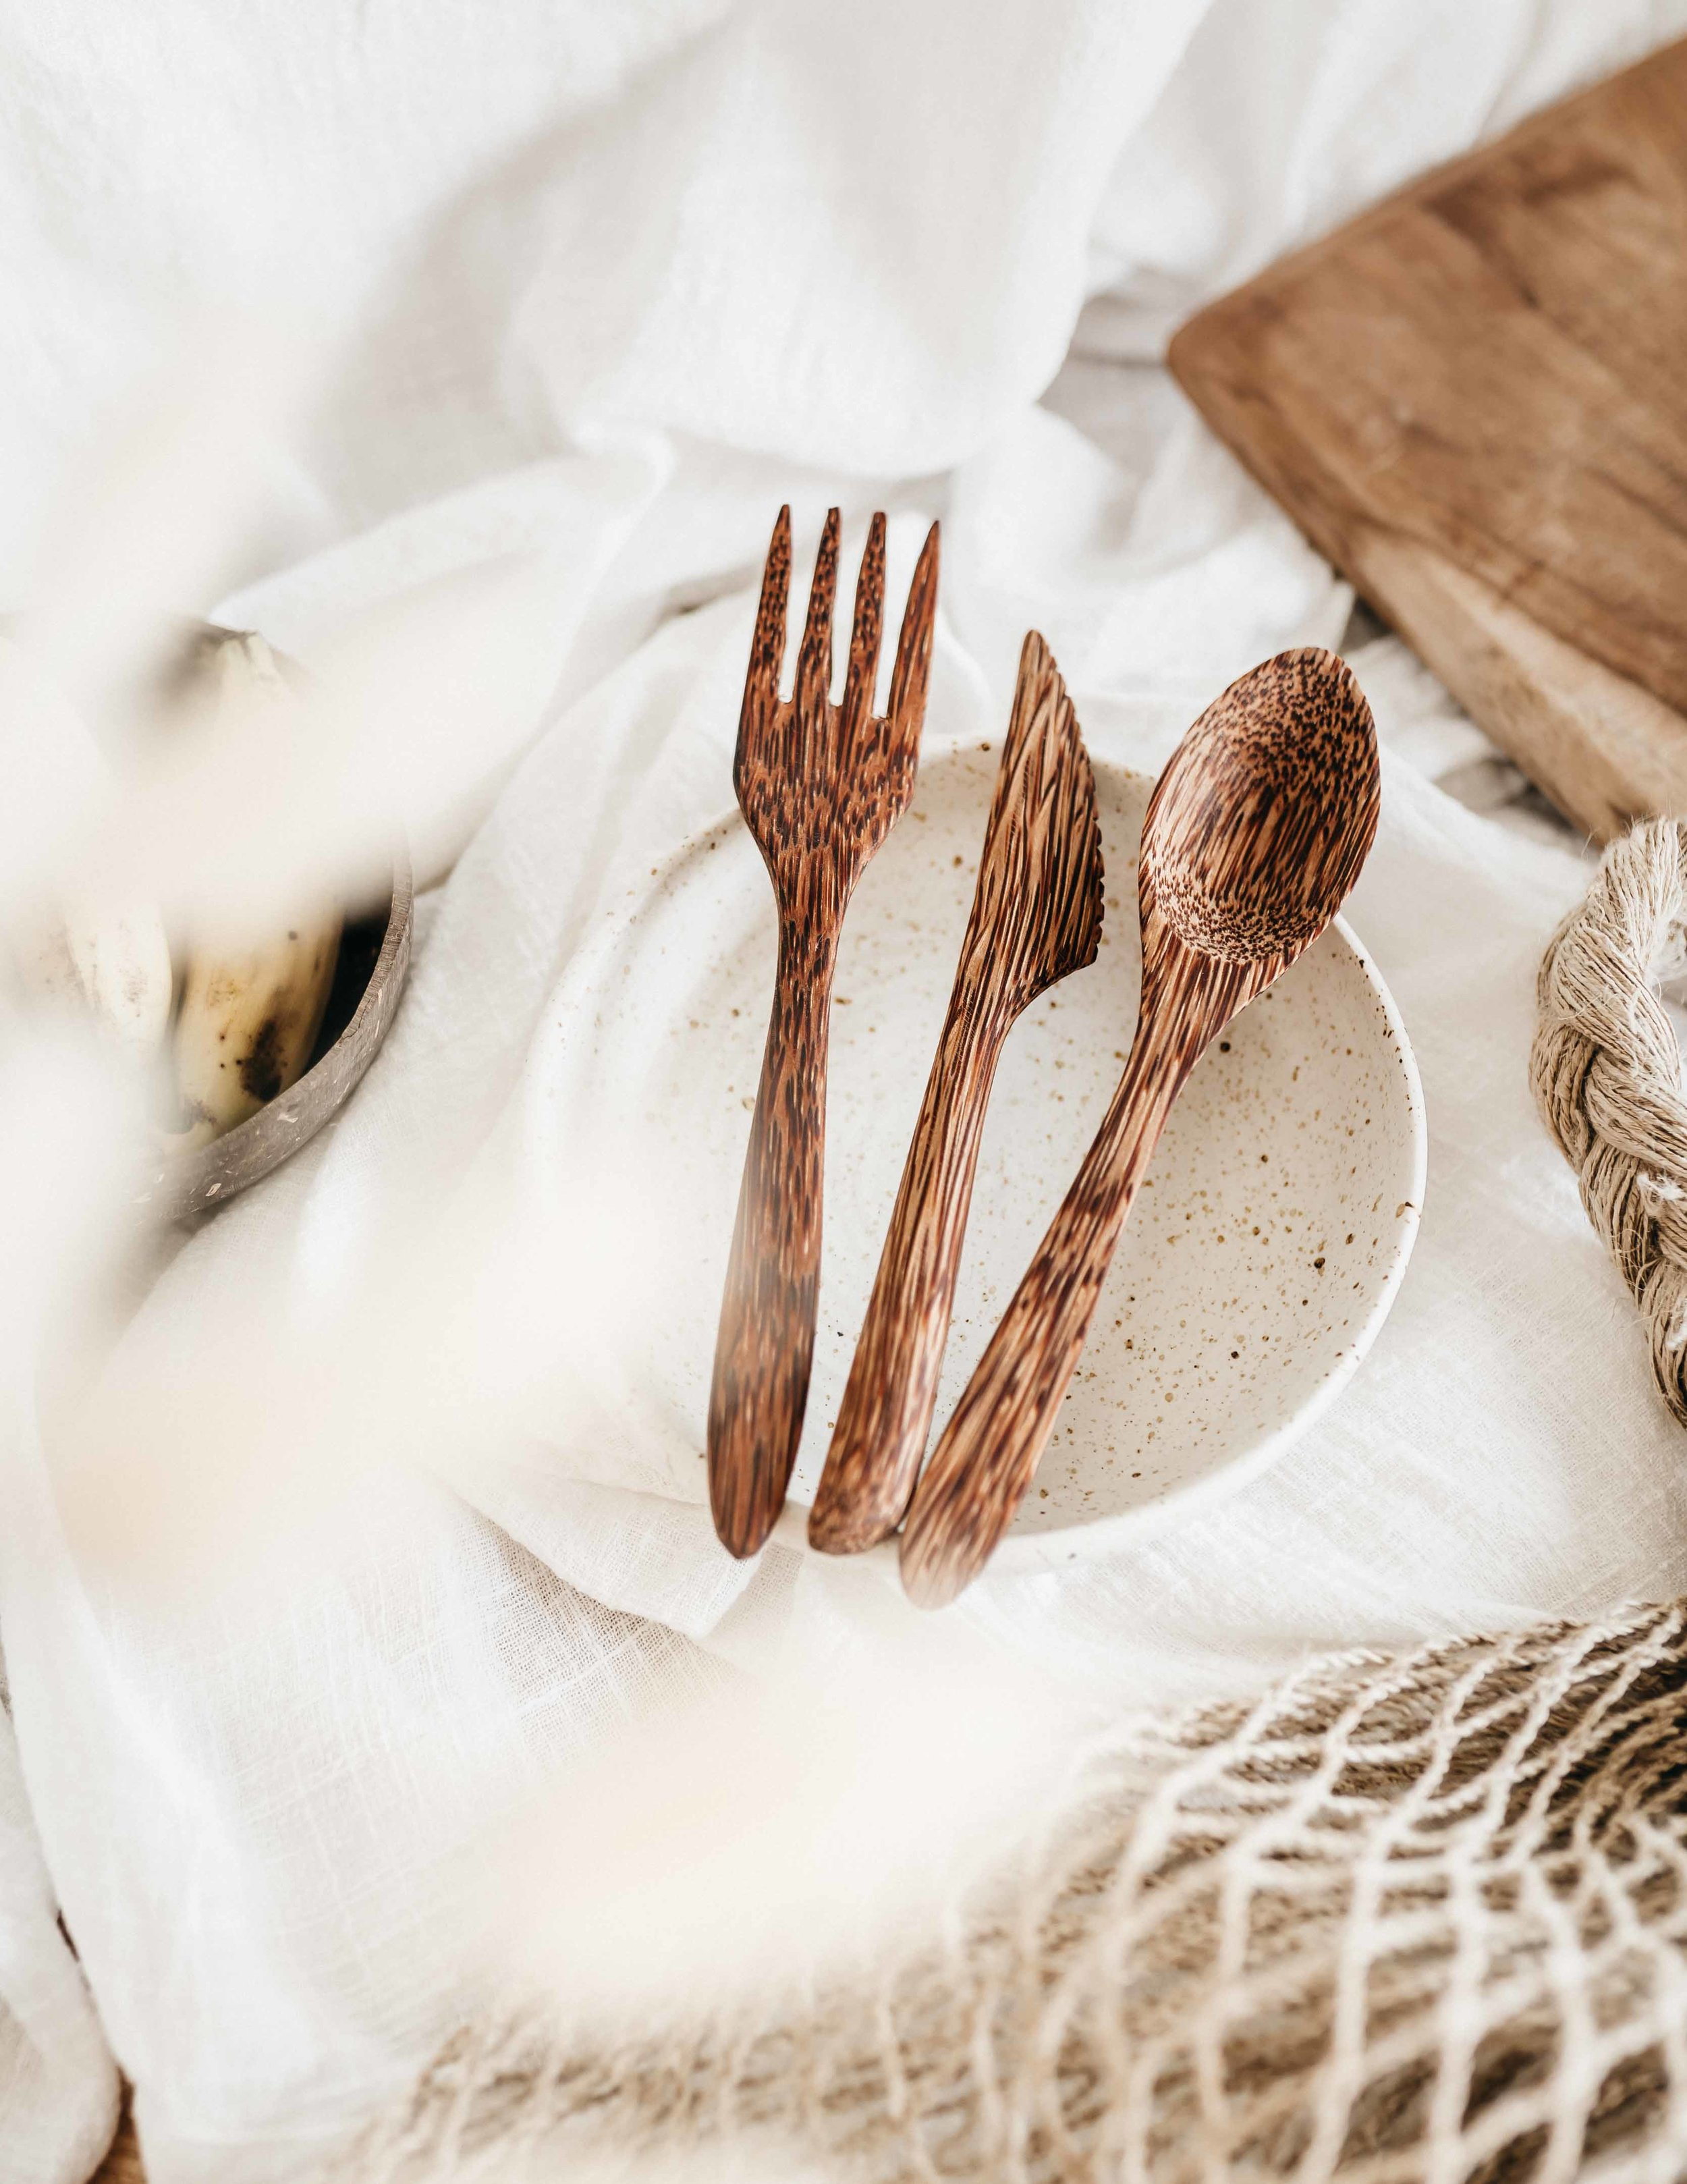 keira-mason-nowhere-and-everywhere-cutlery-zero-waste.jpg